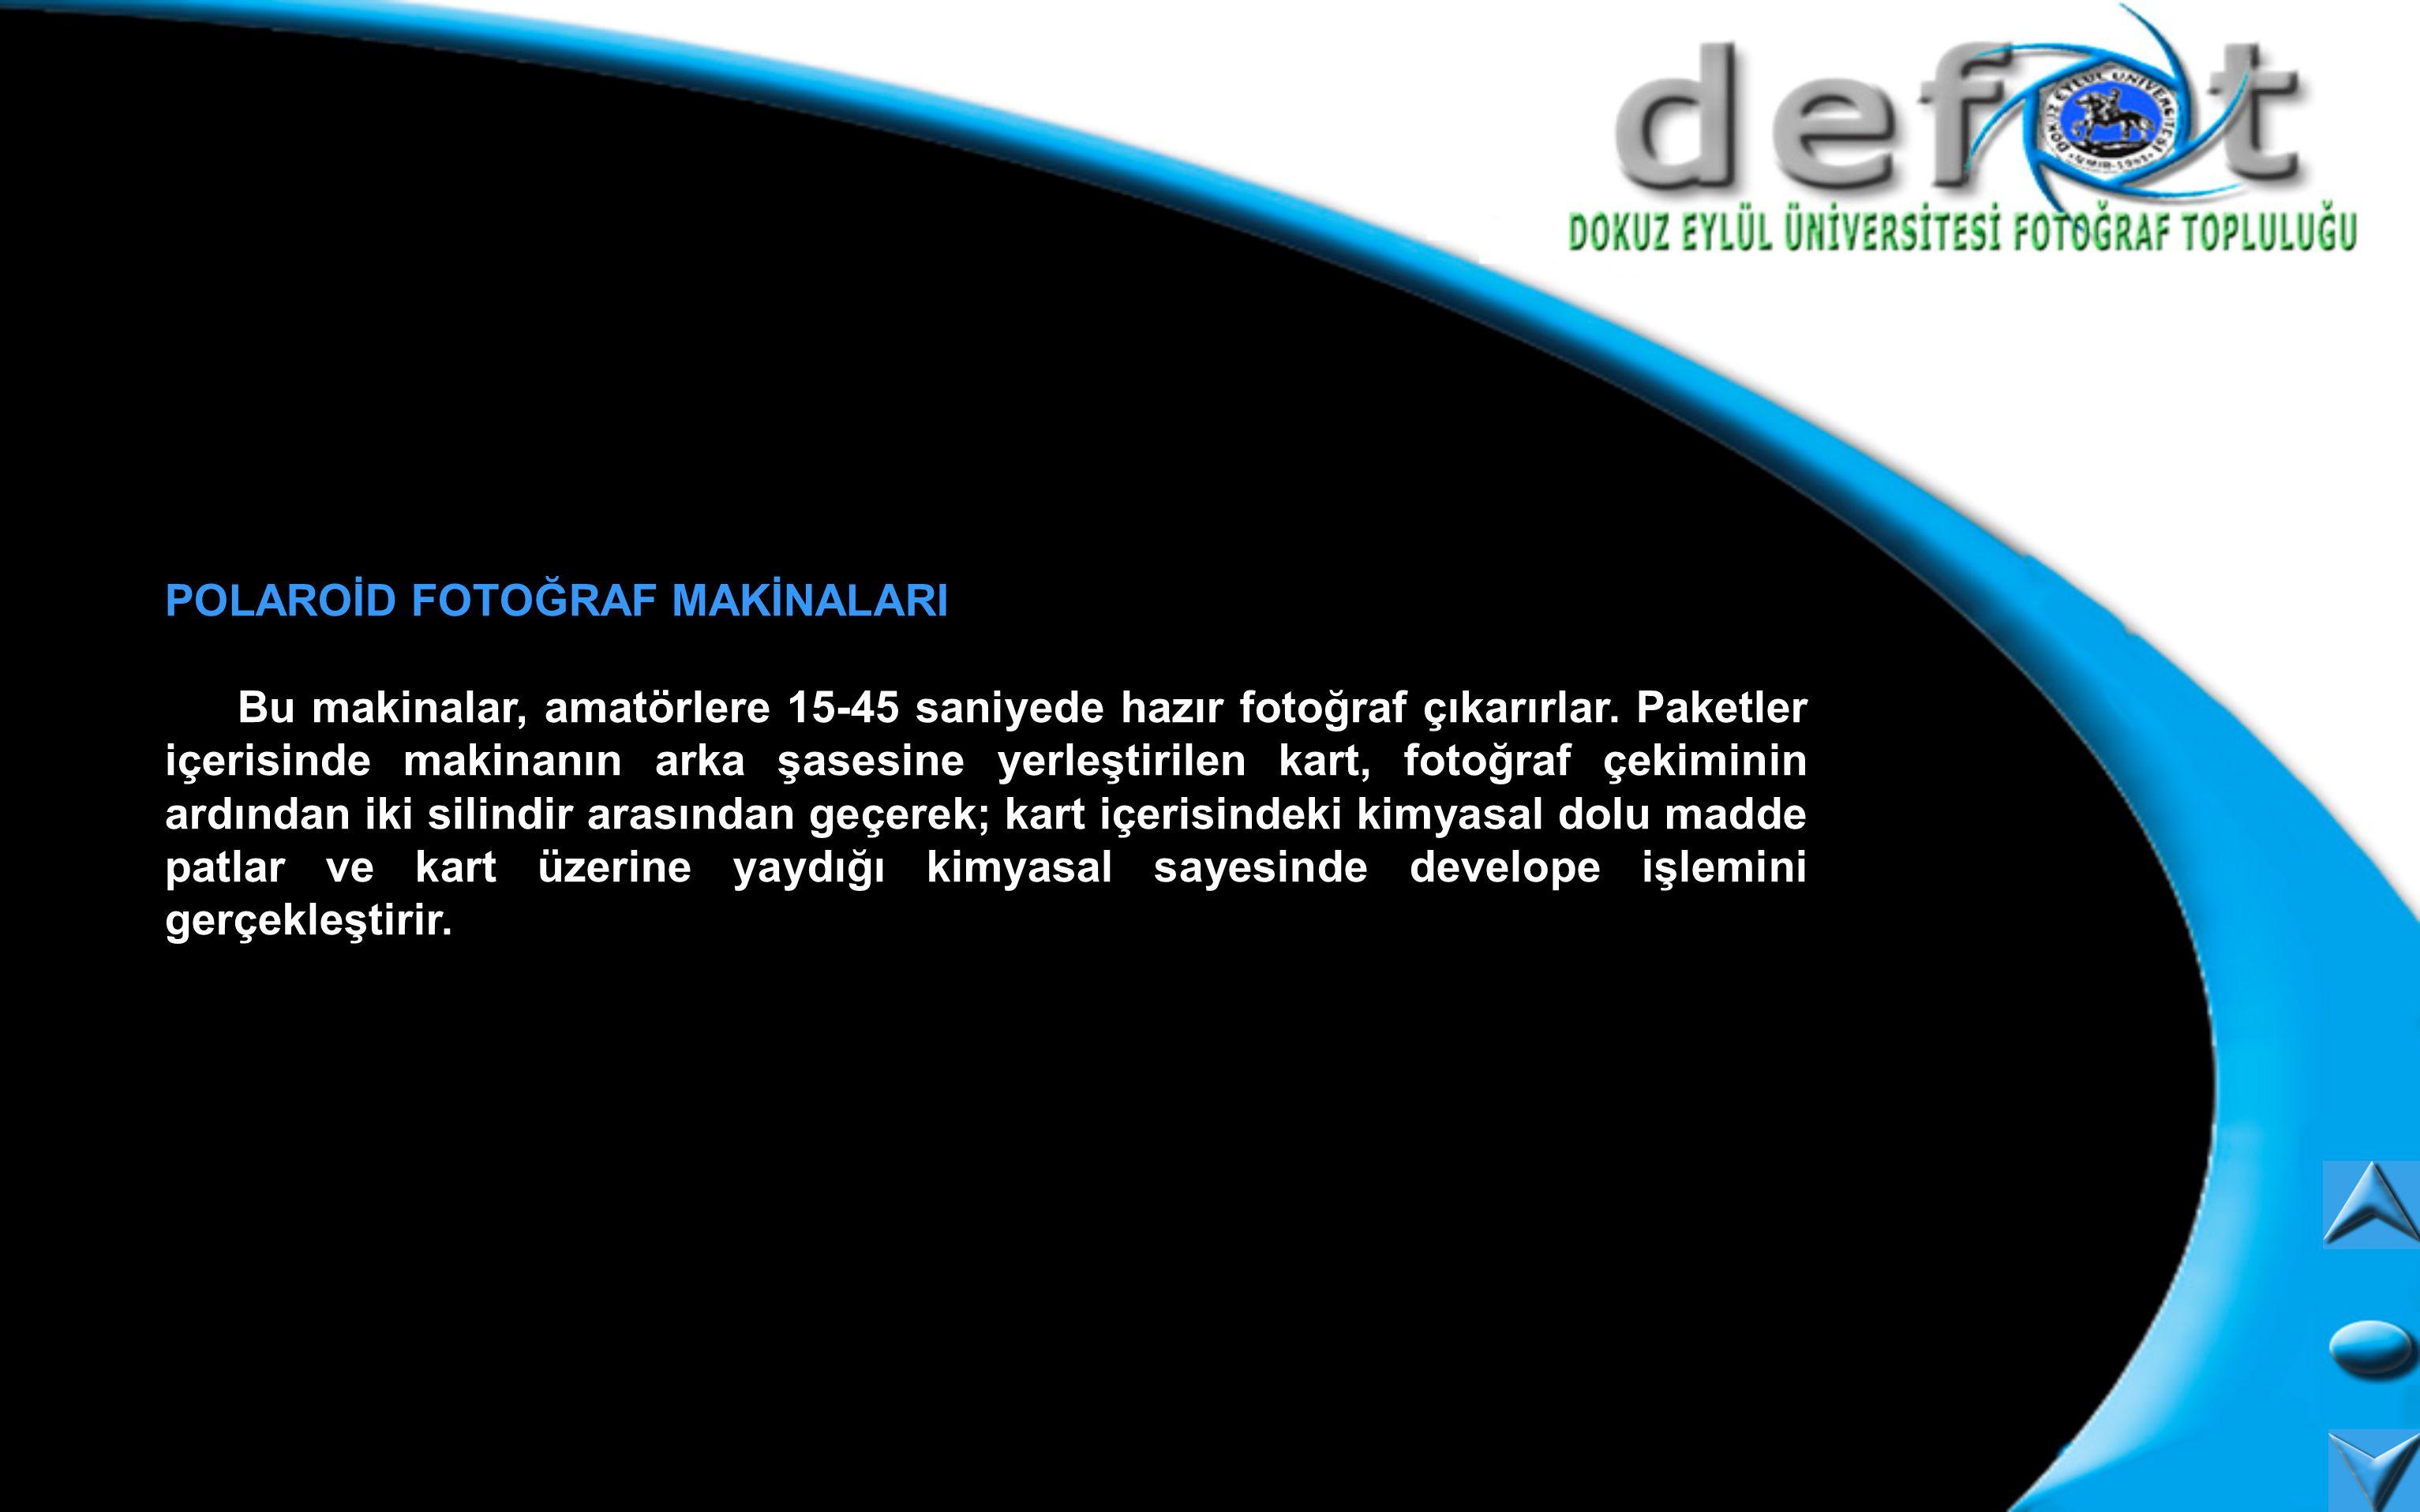 POLAROİD FOTOĞRAF MAKİNALARI